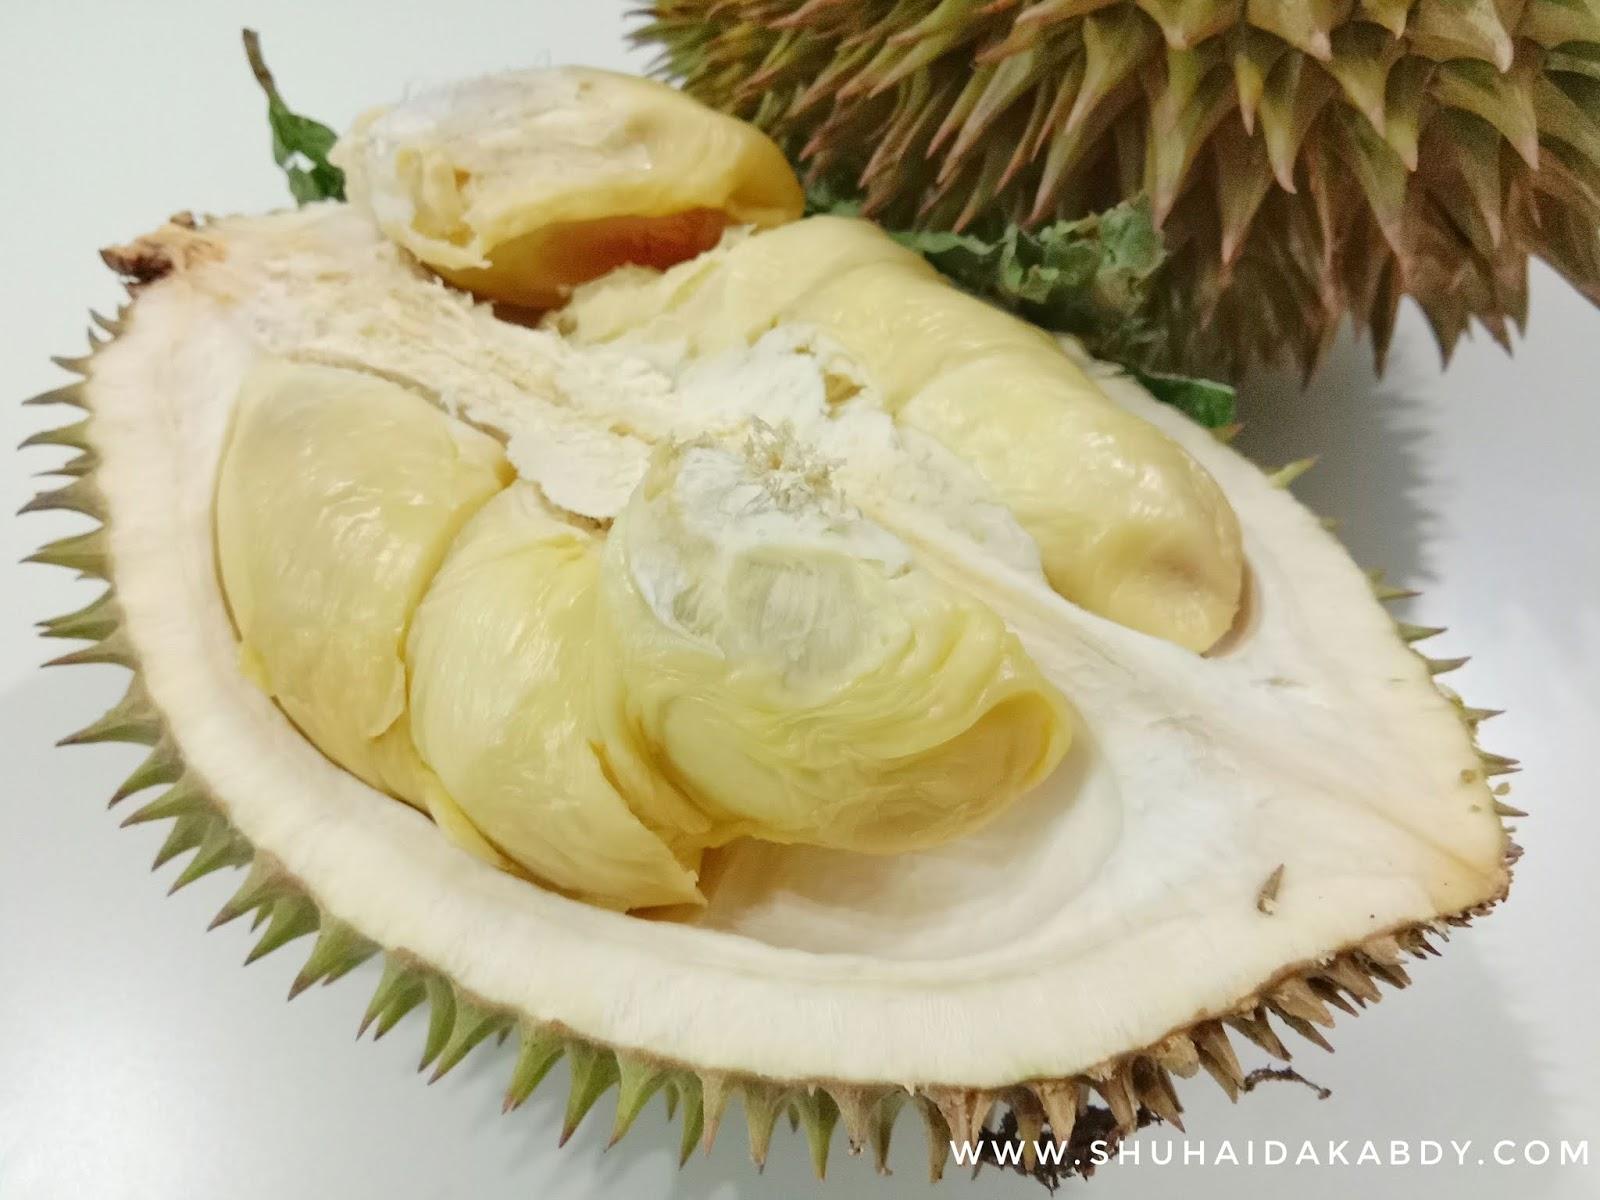 Buah Bermusim, Durian, Durian Kampung